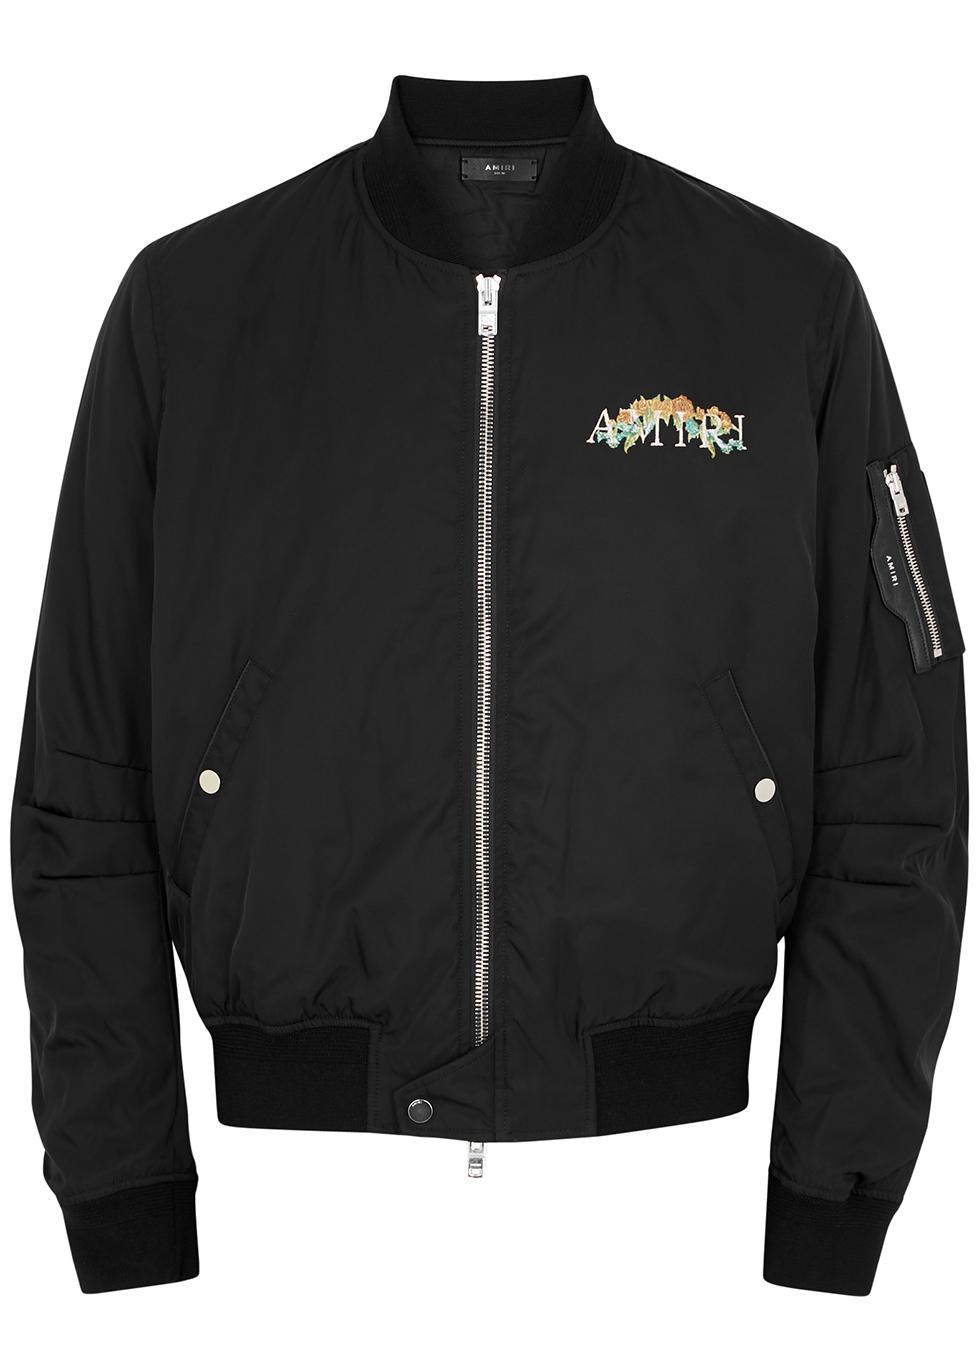 Black embroidered shell bomber jacket